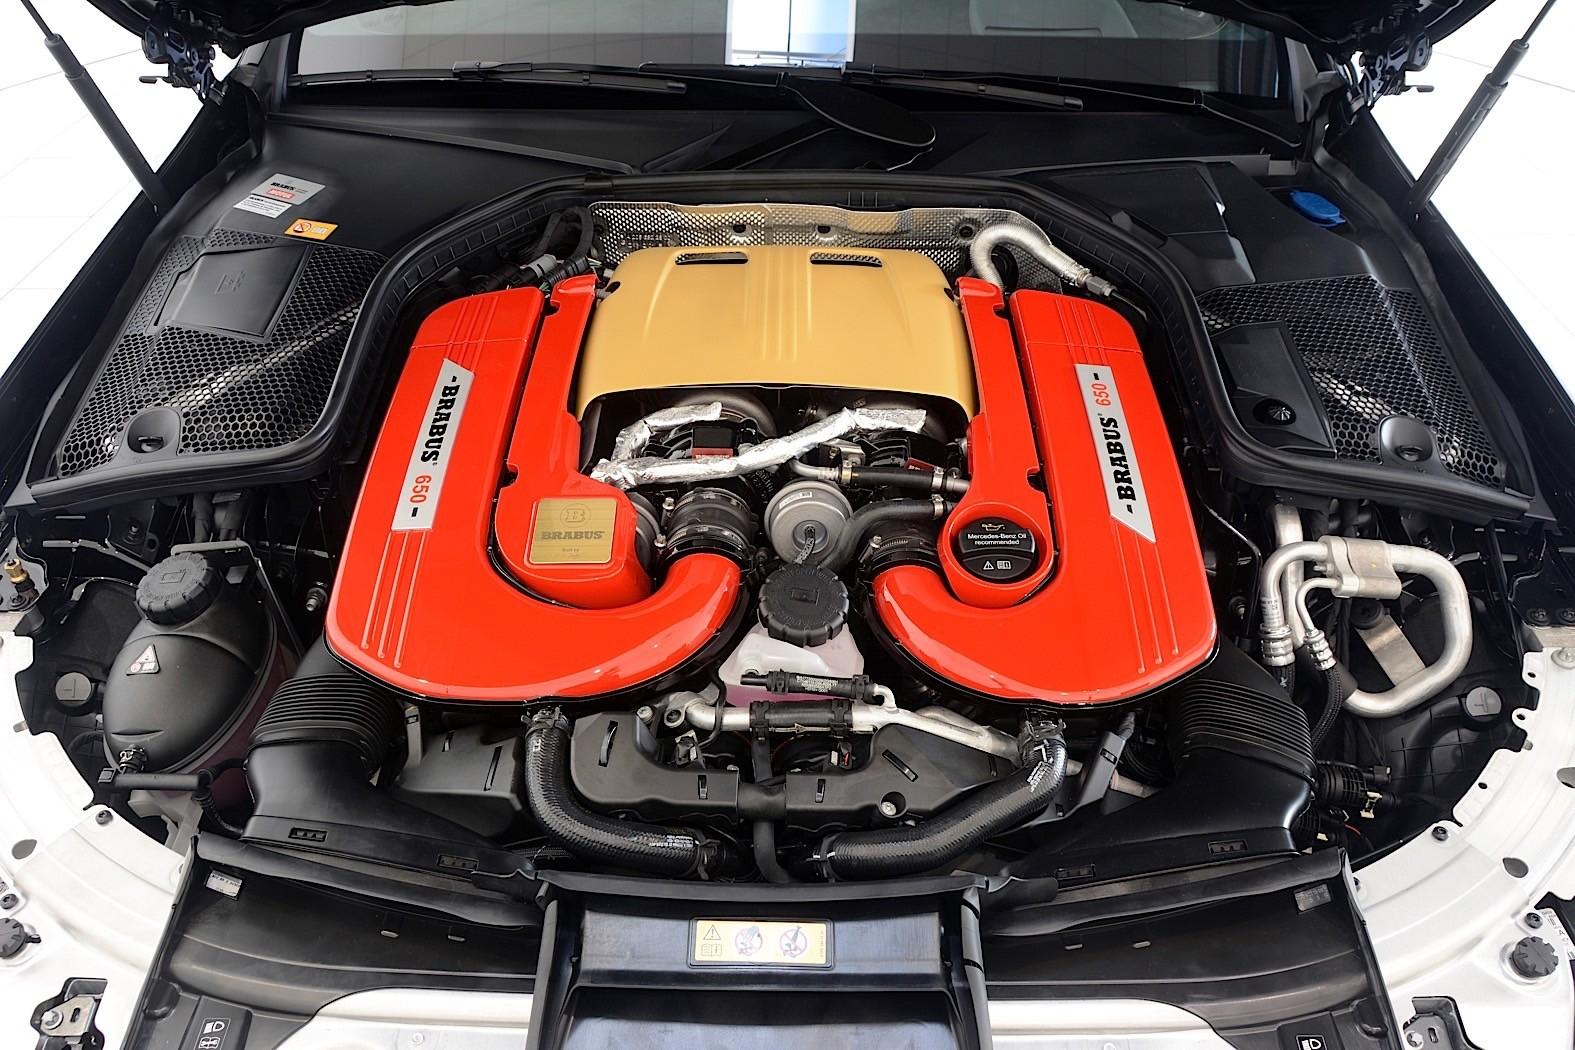 Brabus Endows the MercedesAMG C 63 S with 650 Horsepower